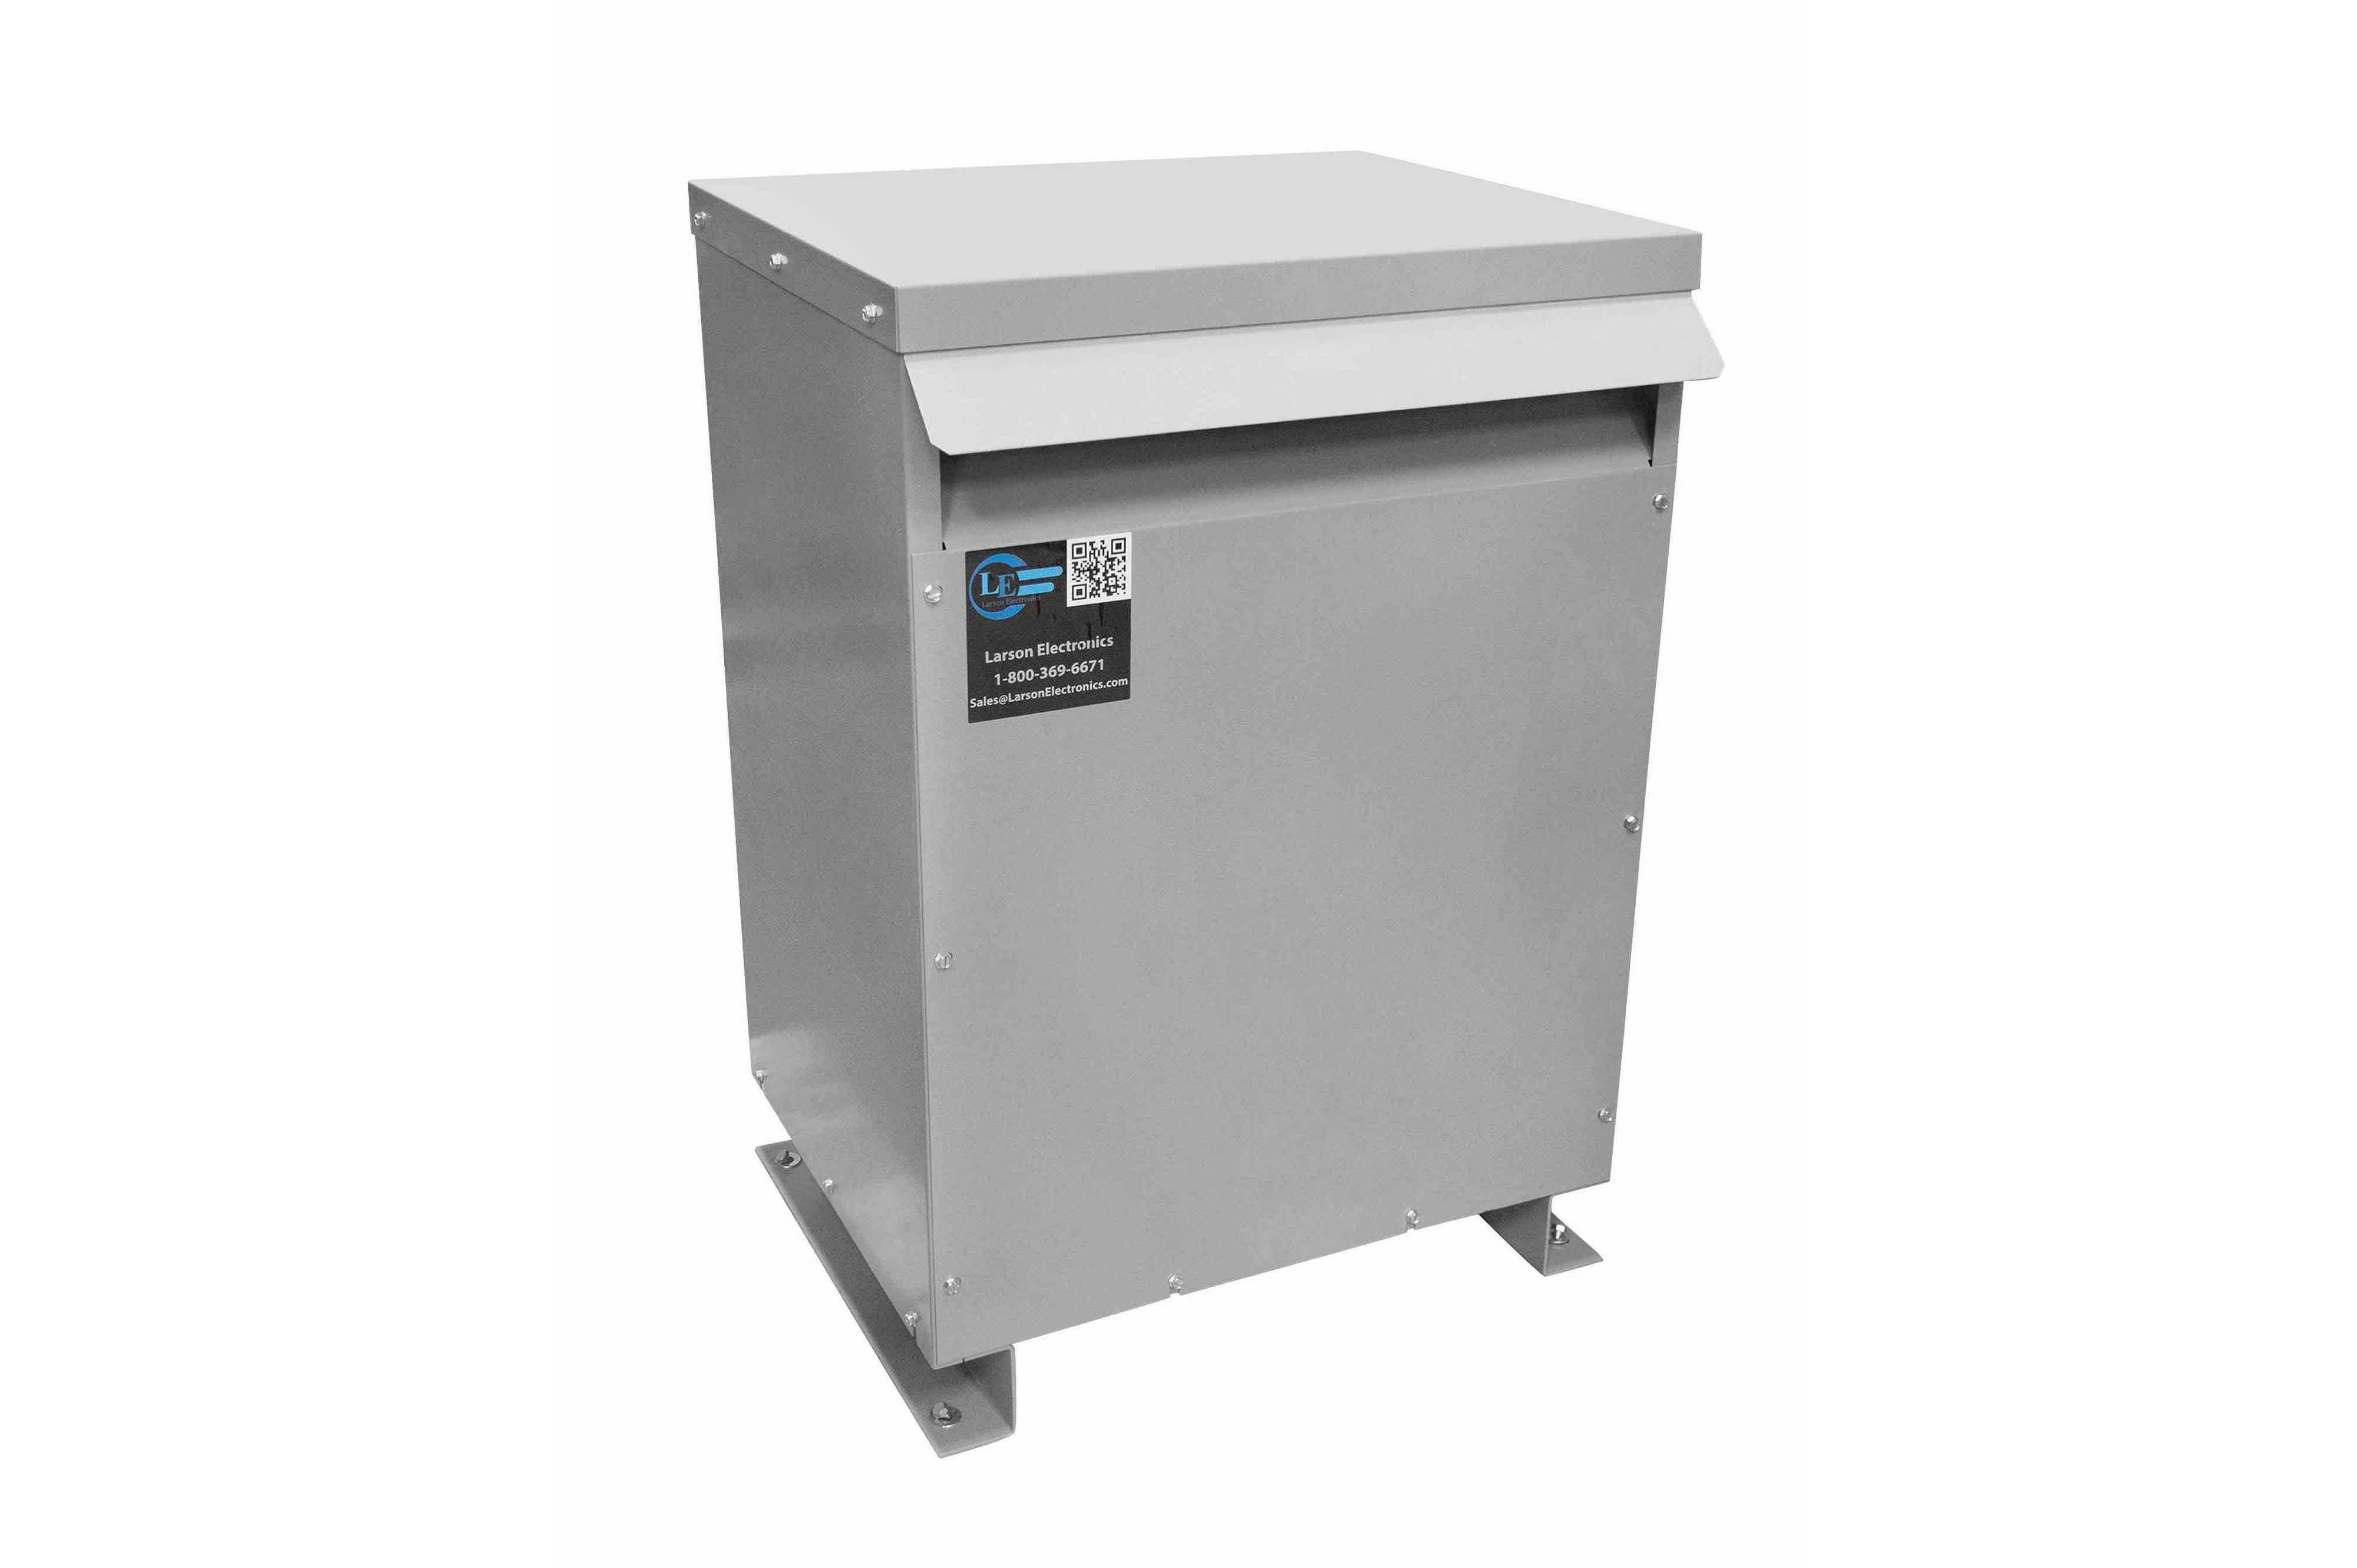 12 kVA 3PH Isolation Transformer, 415V Wye Primary, 208V Delta Secondary, N3R, Ventilated, 60 Hz